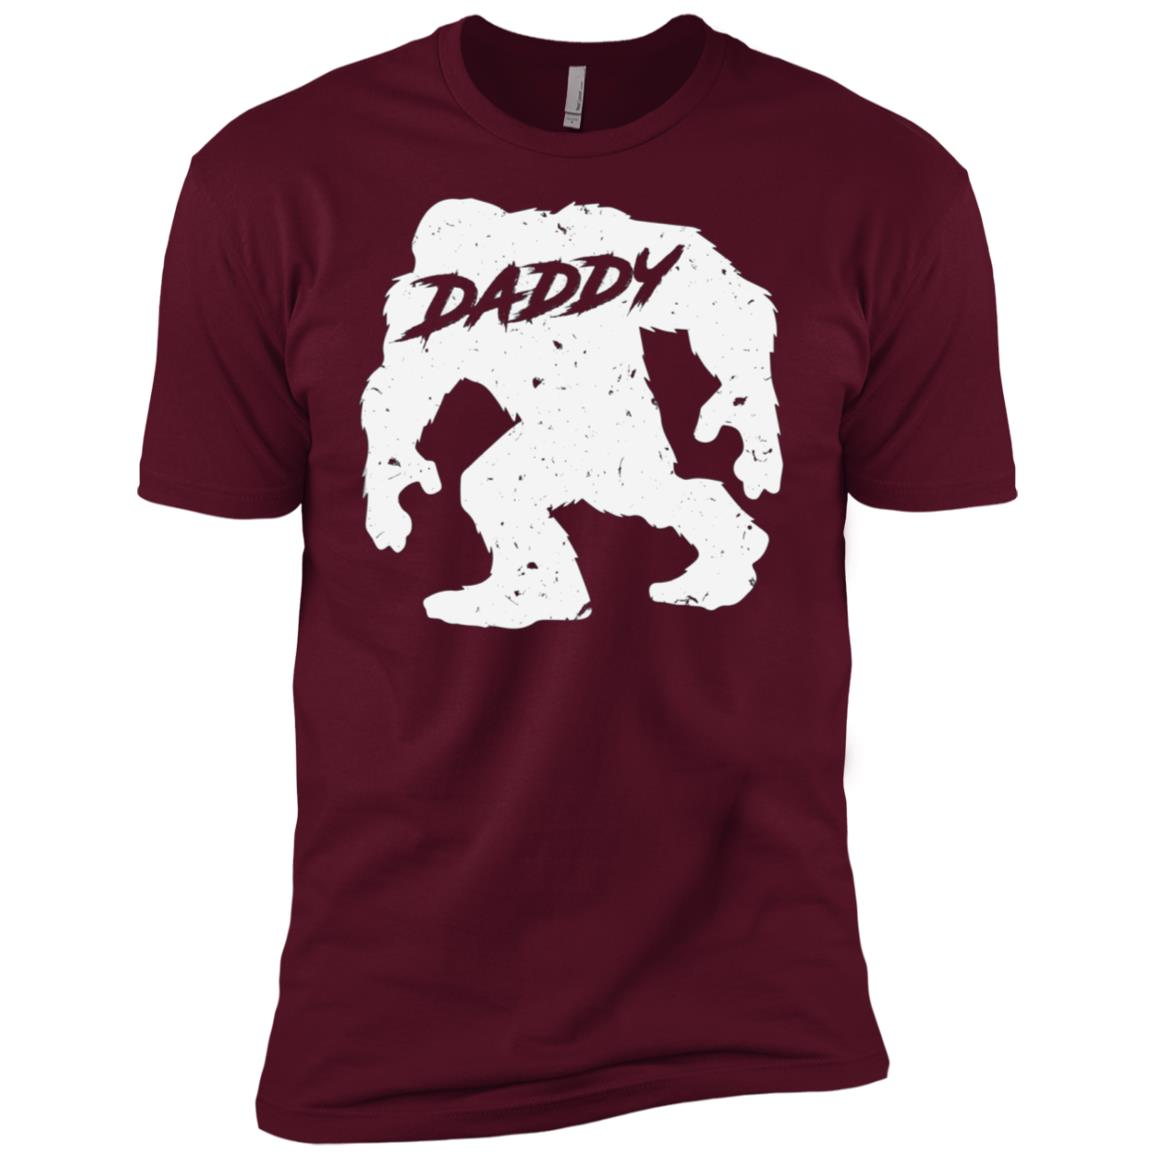 Daddy Bigfoot Sasquatch Yeti Fathers Day Gift Tee-1 Men Short Sleeve T-Shirt